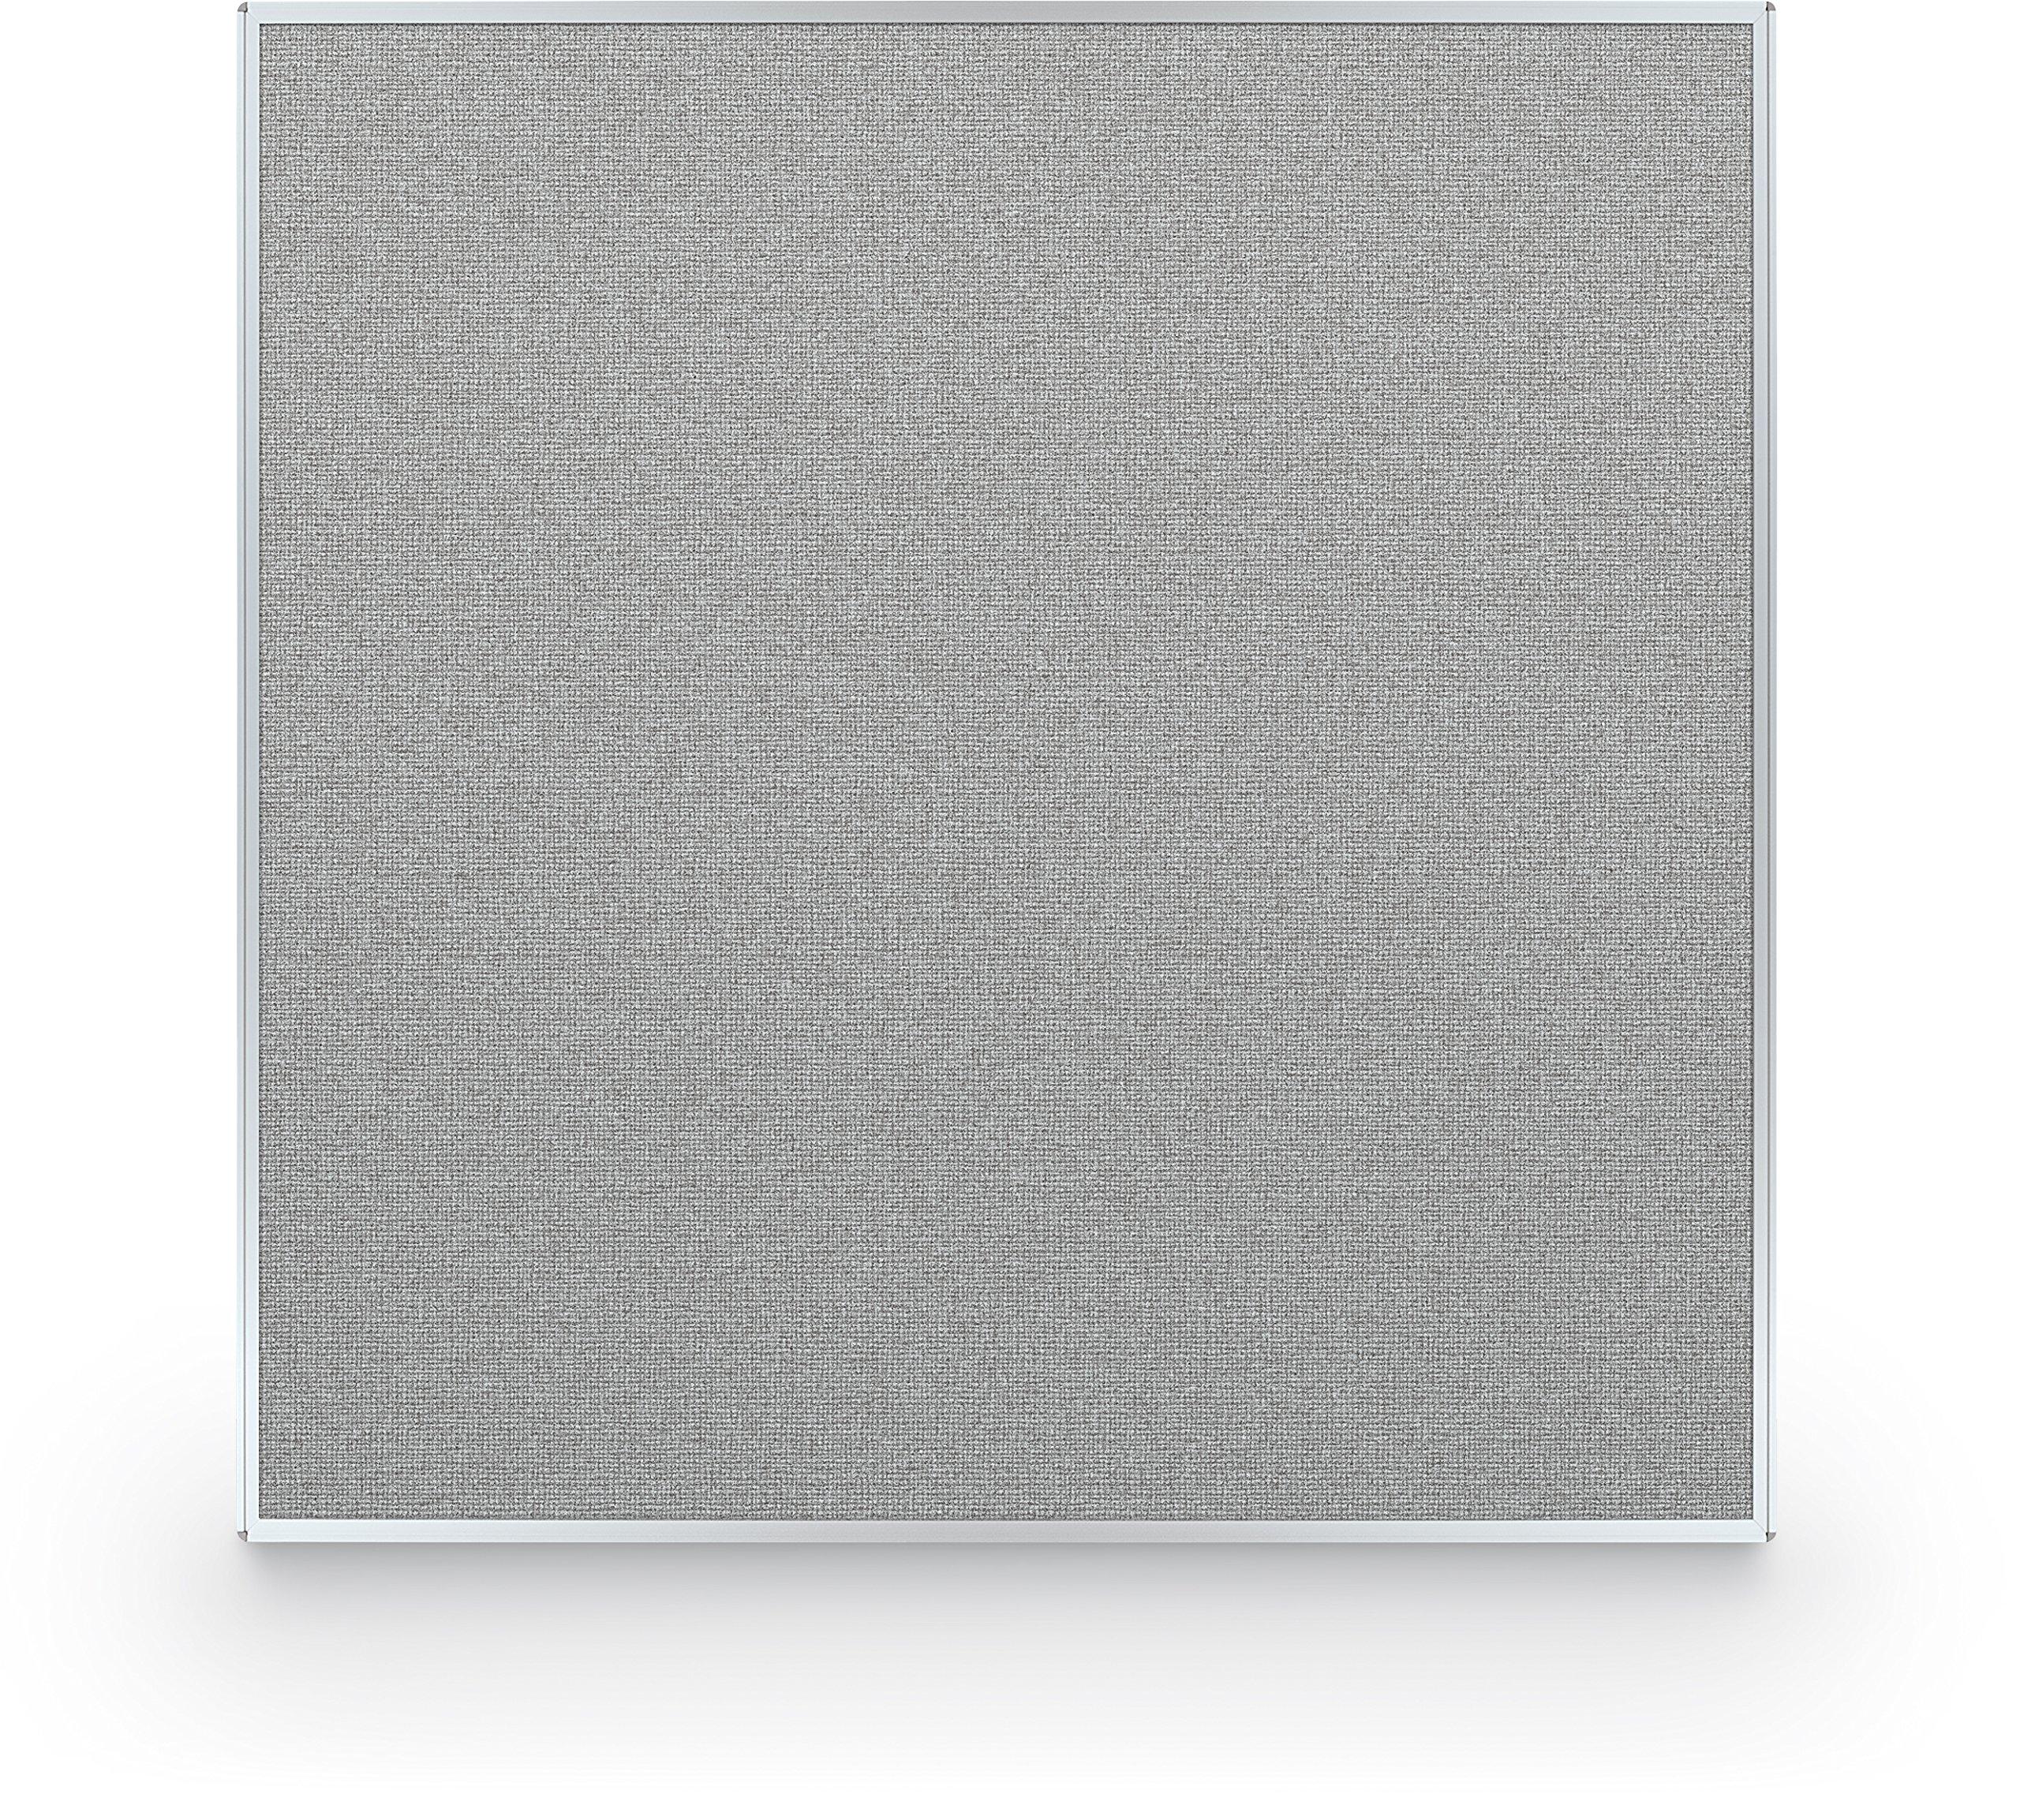 Best-Rite 60 x 60 Inch Standard Modular Divider Panel, Gray Fabric Panel, (66217-88) by Best-Rite